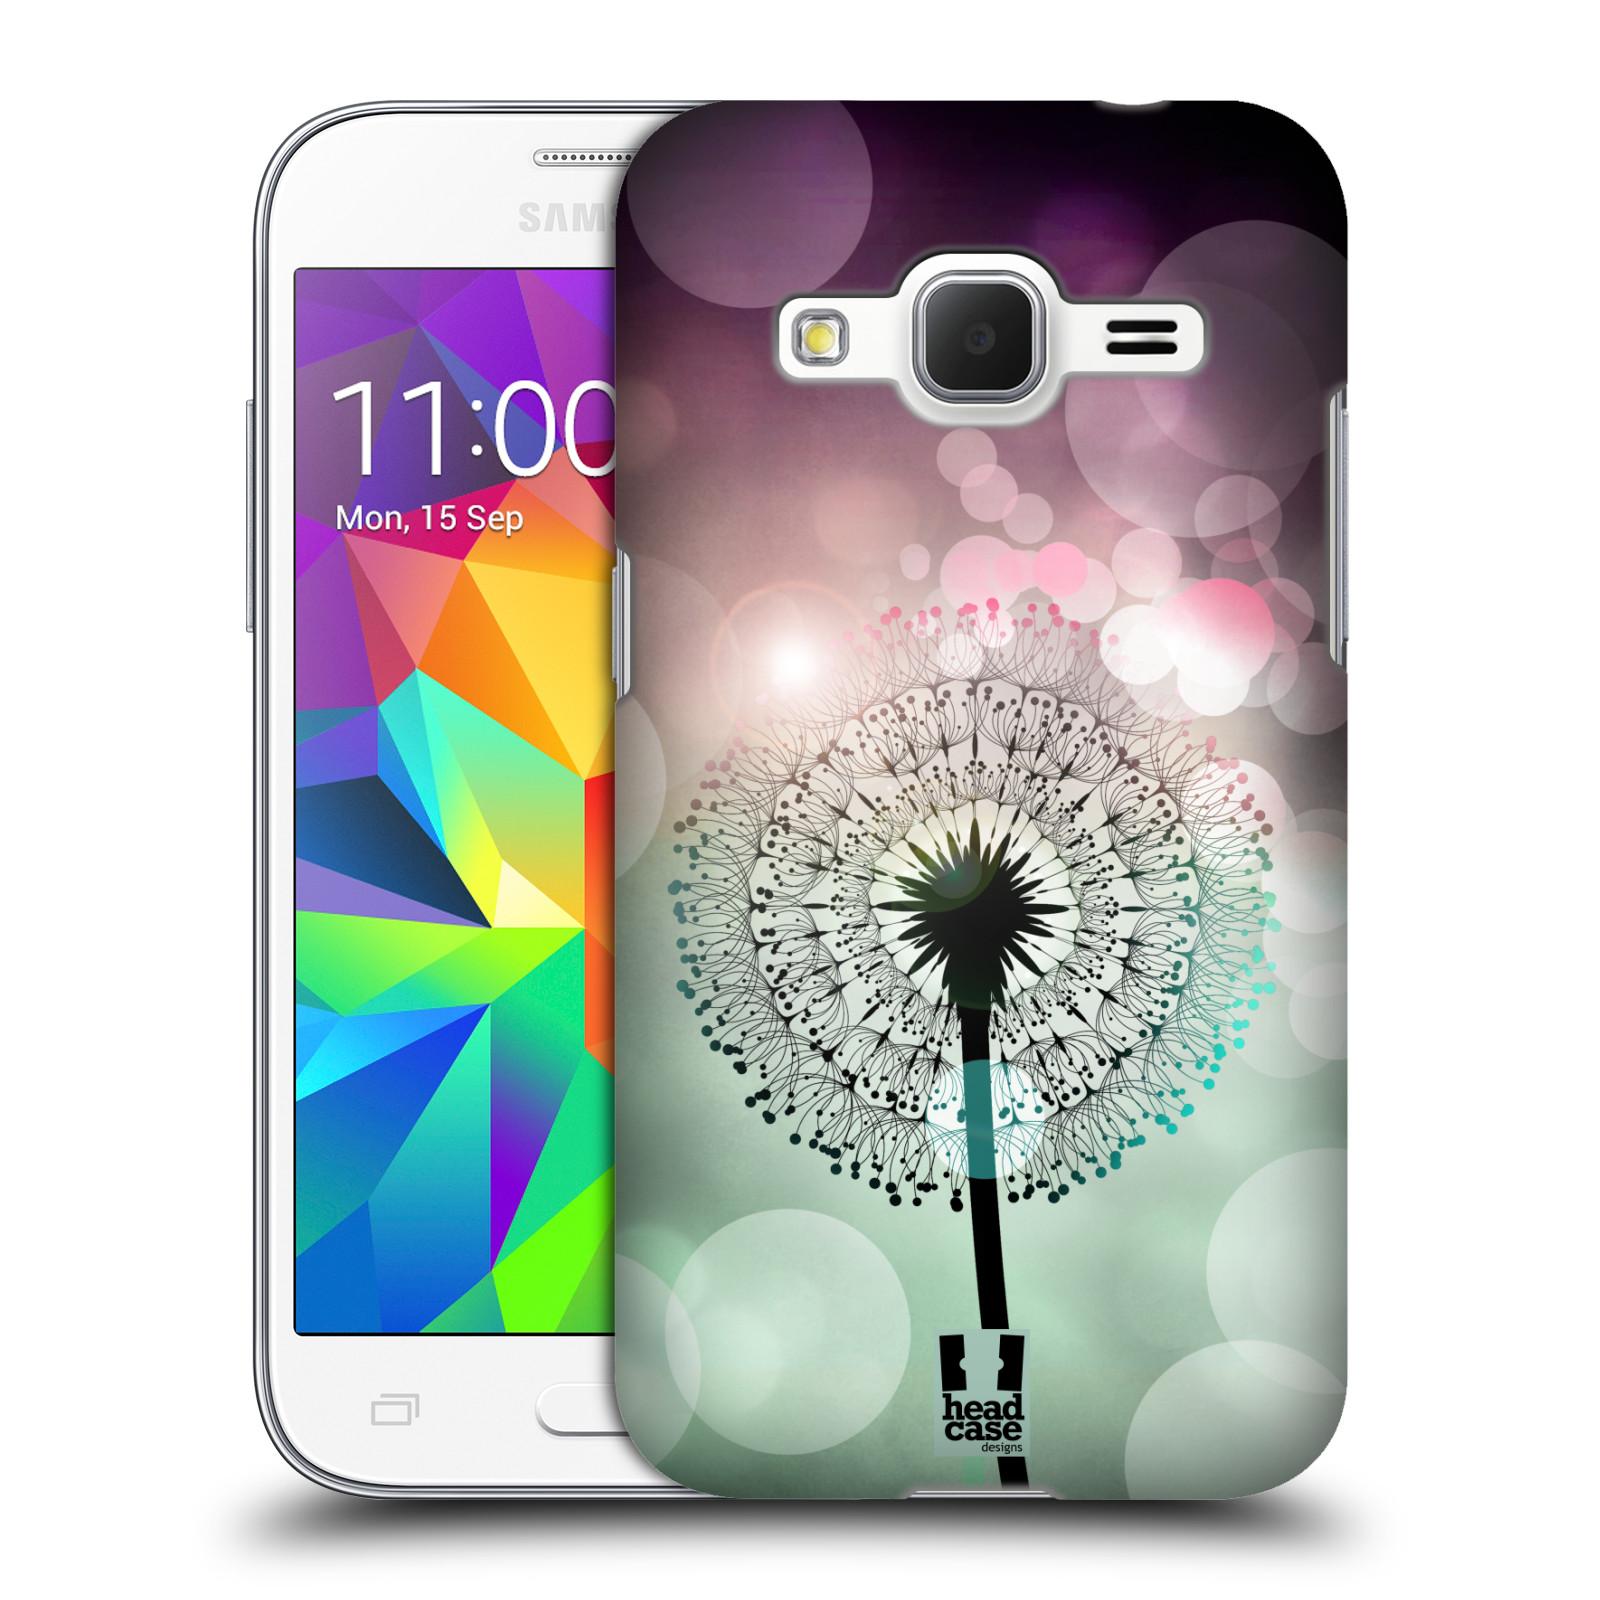 Plastové pouzdro na mobil Samsung Galaxy Core Prime LTE HEAD CASE Pampeliškové odlesky (Kryt či obal na mobilní telefon Samsung Galaxy Core Prime LTE SM-G360)